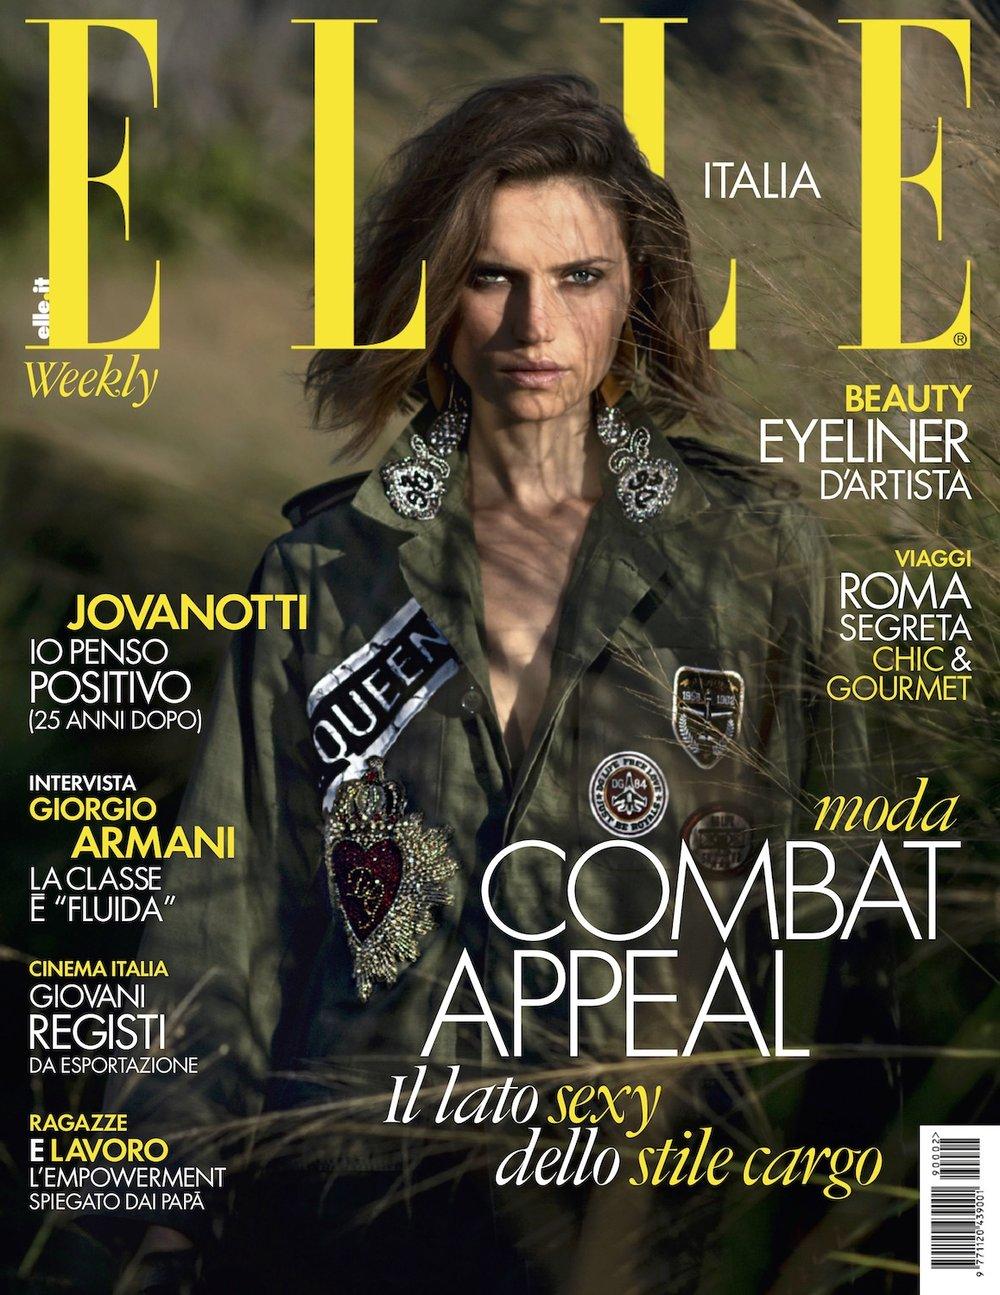 Cato Van Ee for Elle Italia Jan 2019 (2).jpg